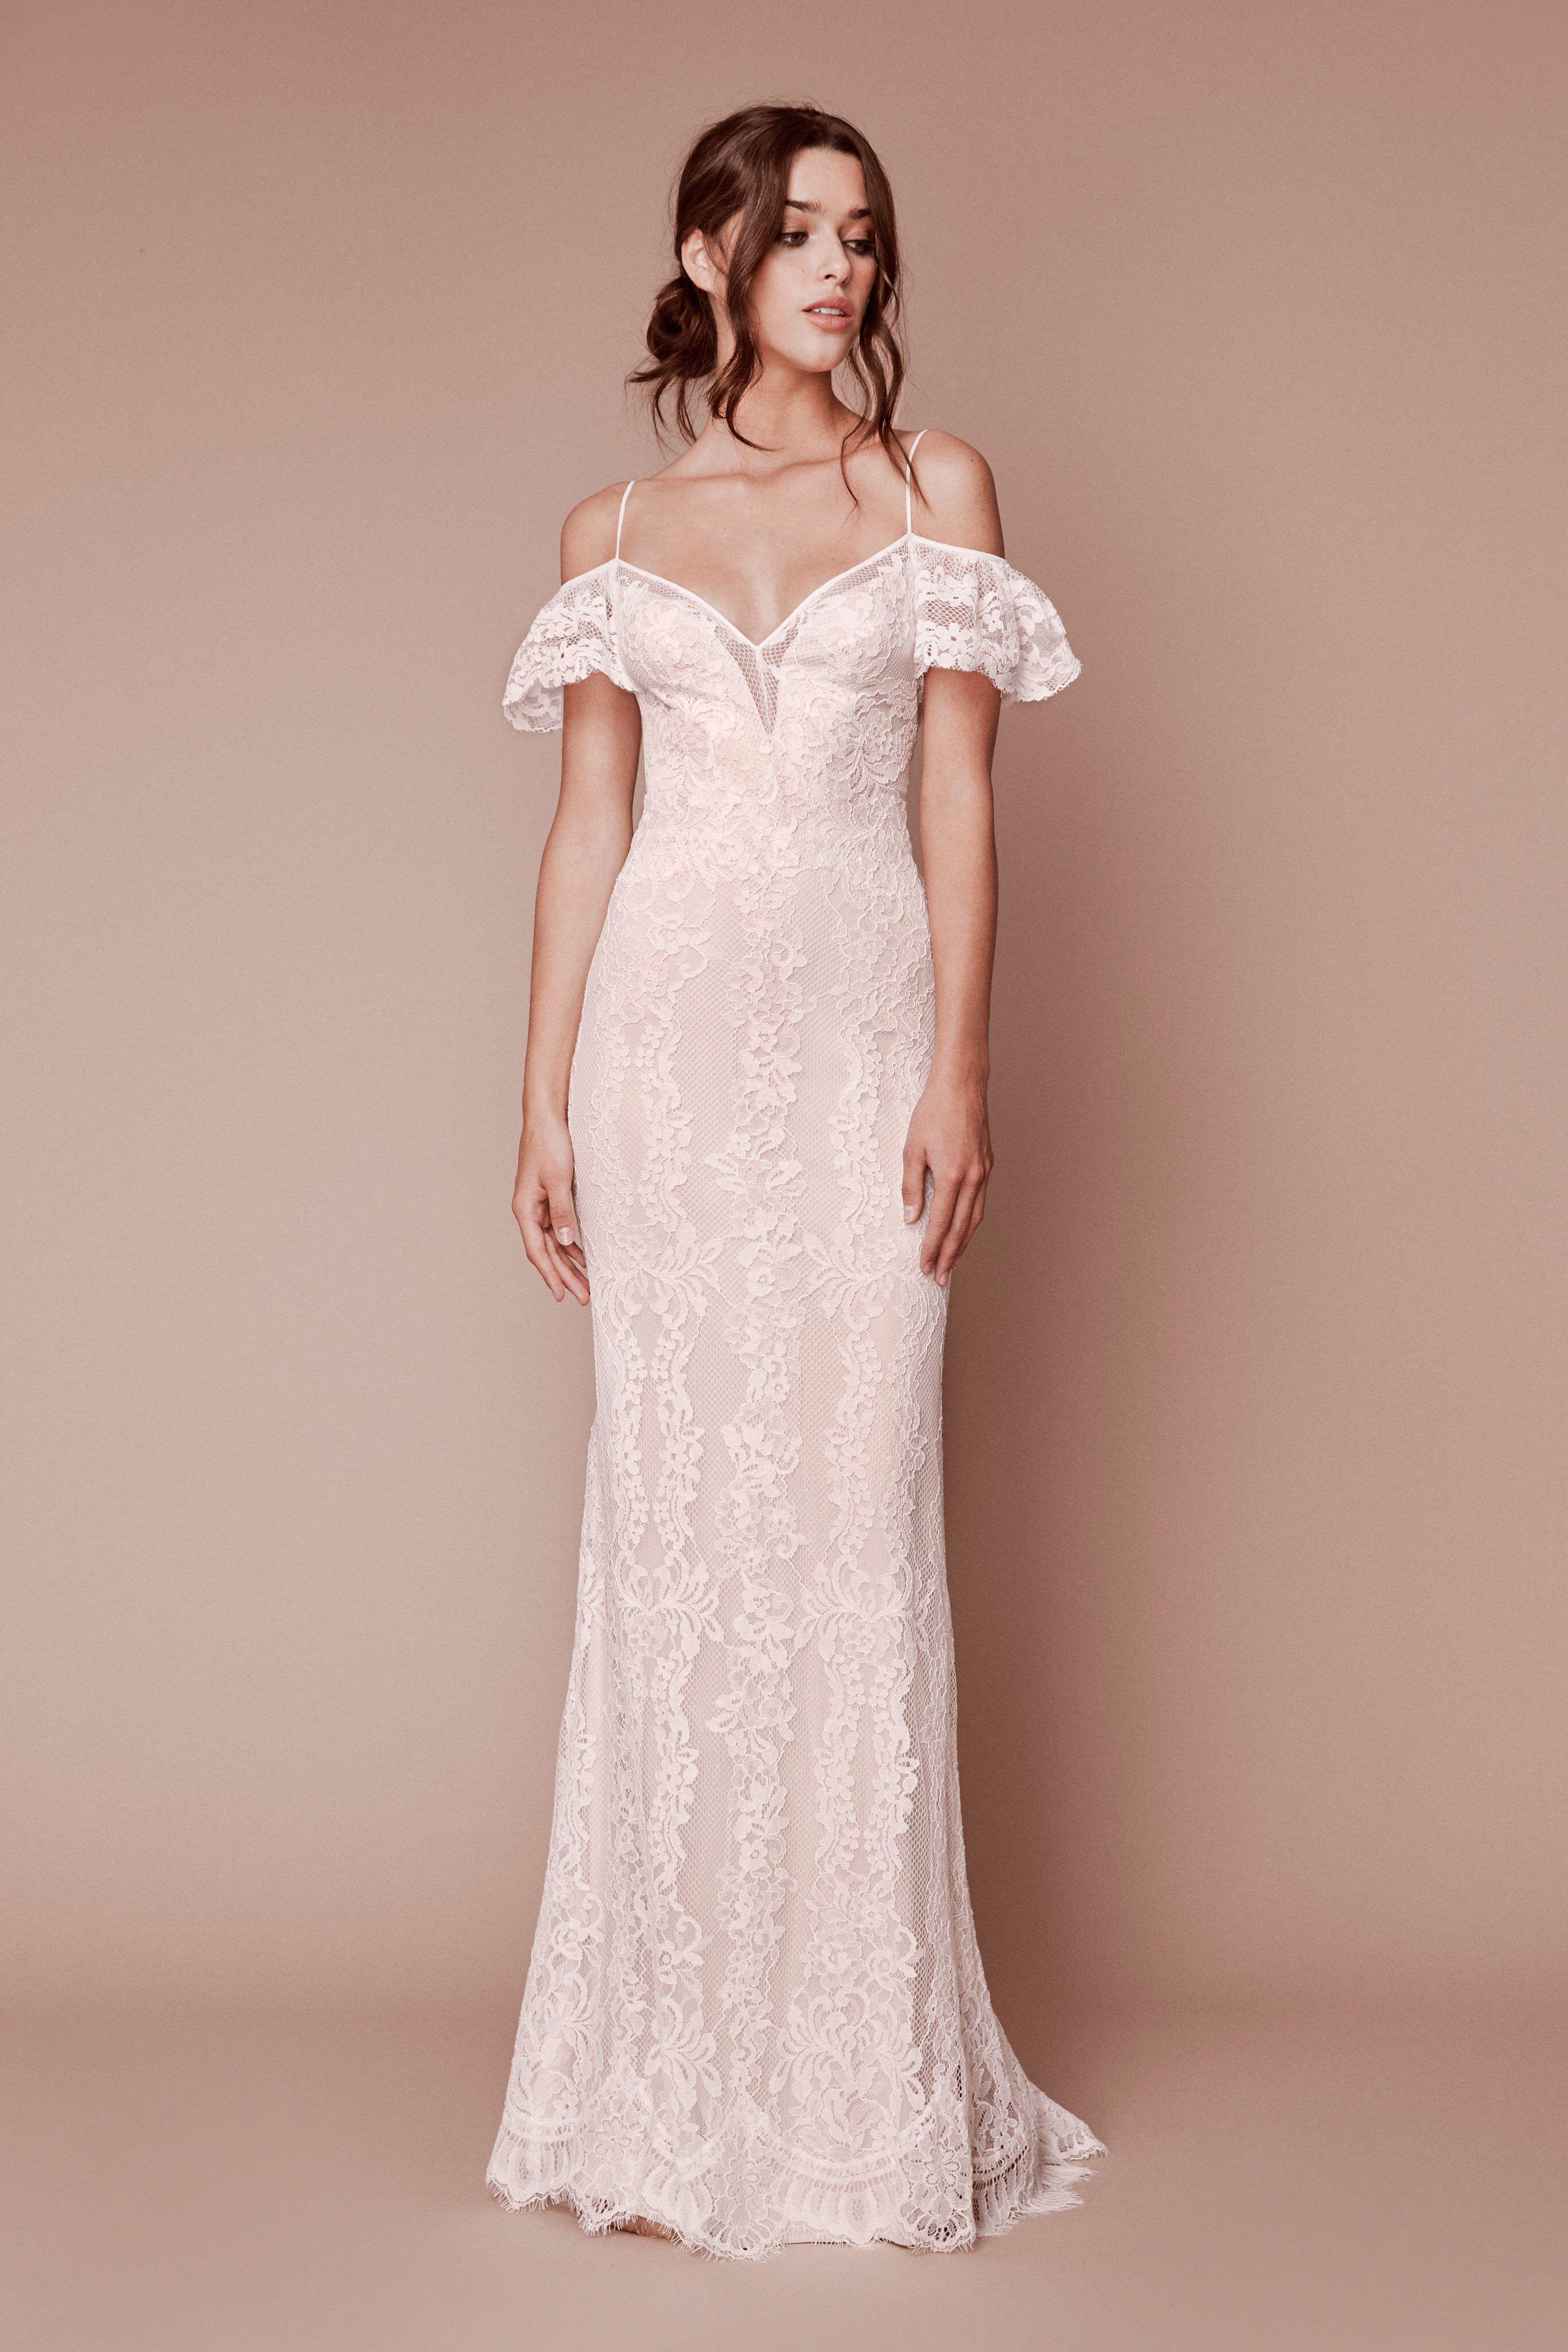 Tadashi shoji bridal fall 2019 fashion show wedding